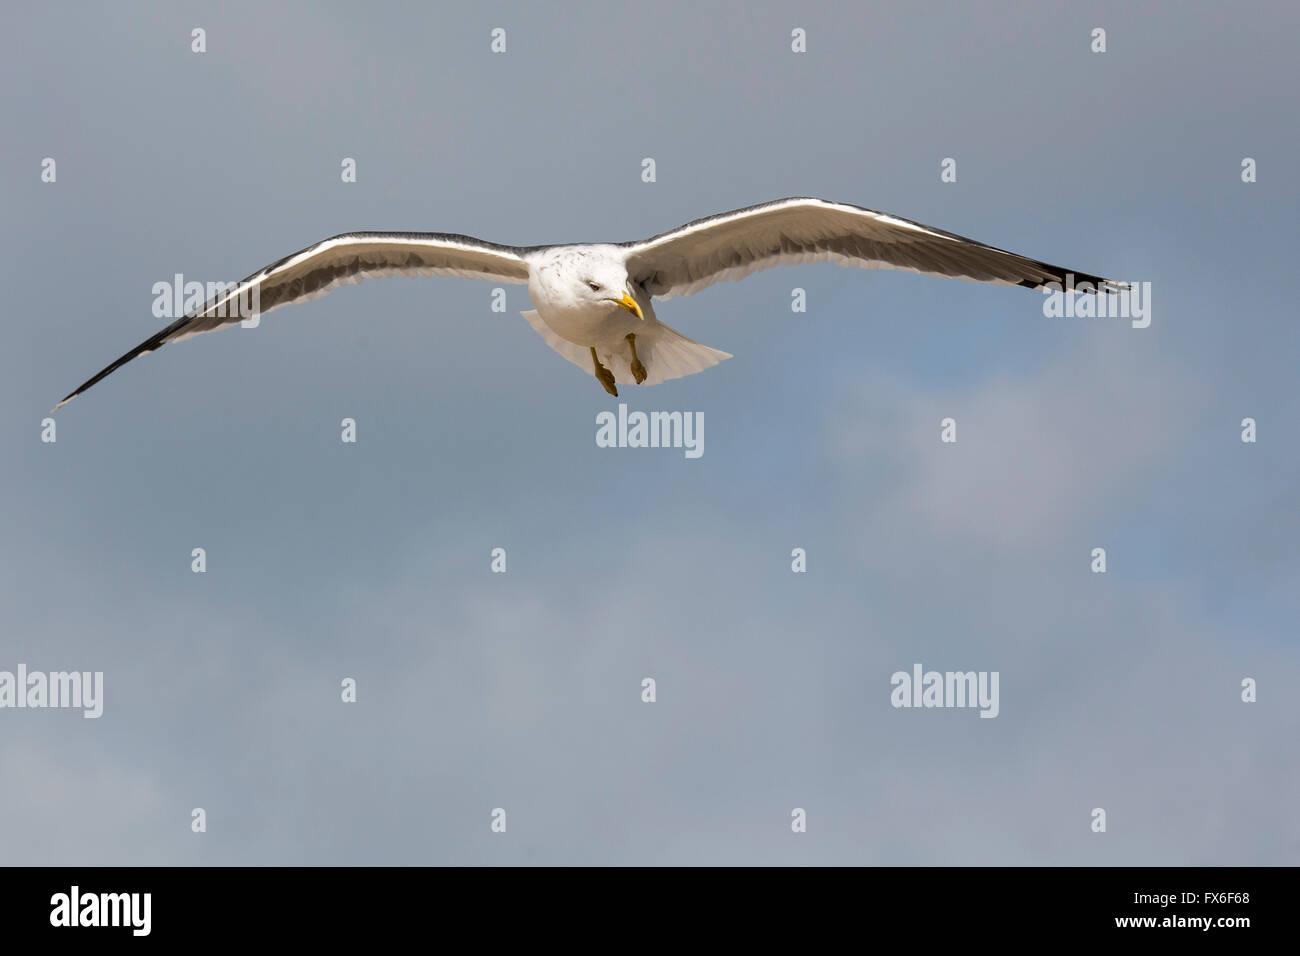 Gull flying, Cadiz, Andalusia Spain. Europe - Stock Image